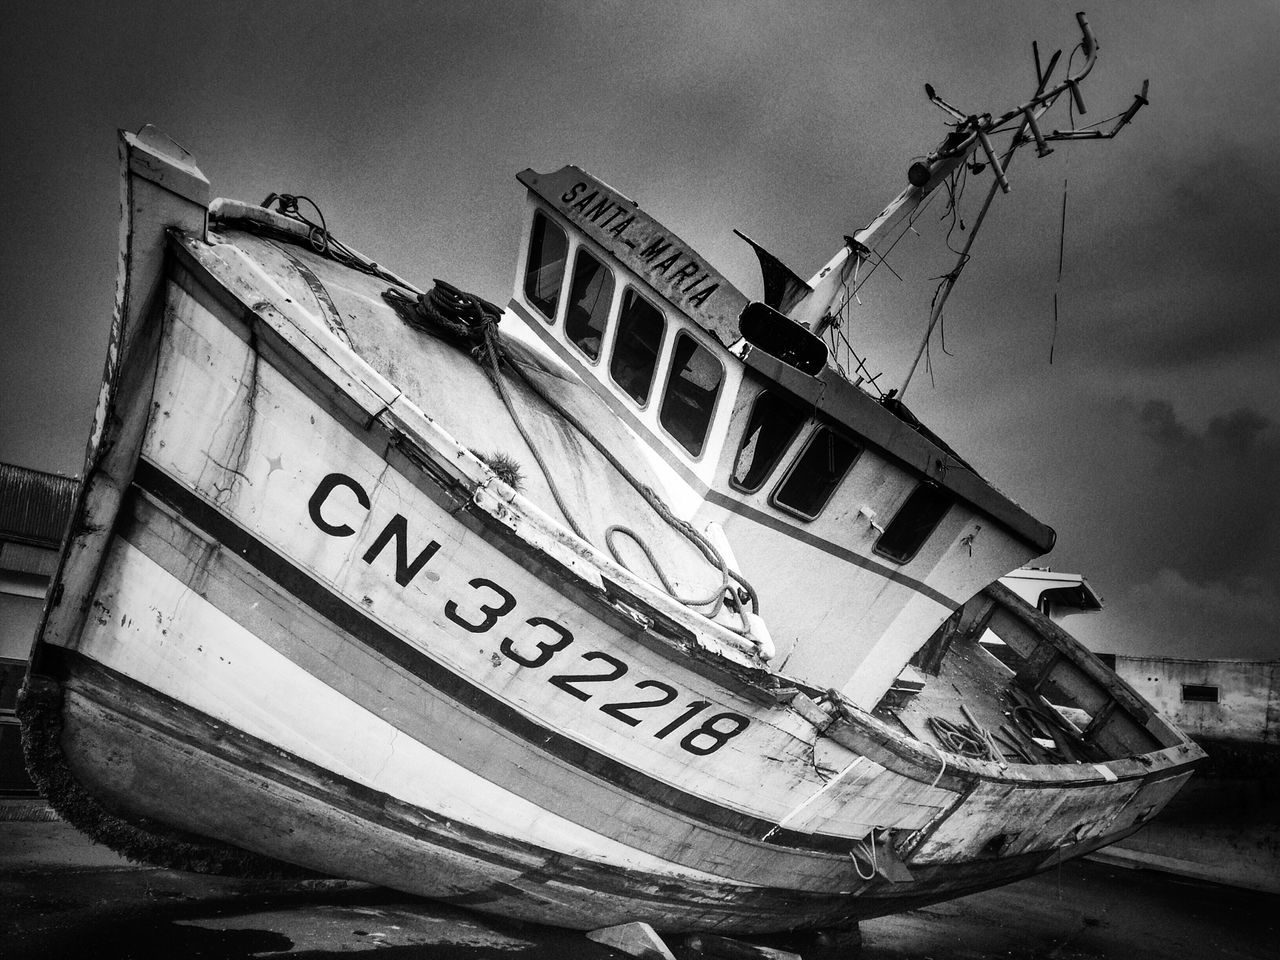 B&w Blackandwhite Boat Fishboat